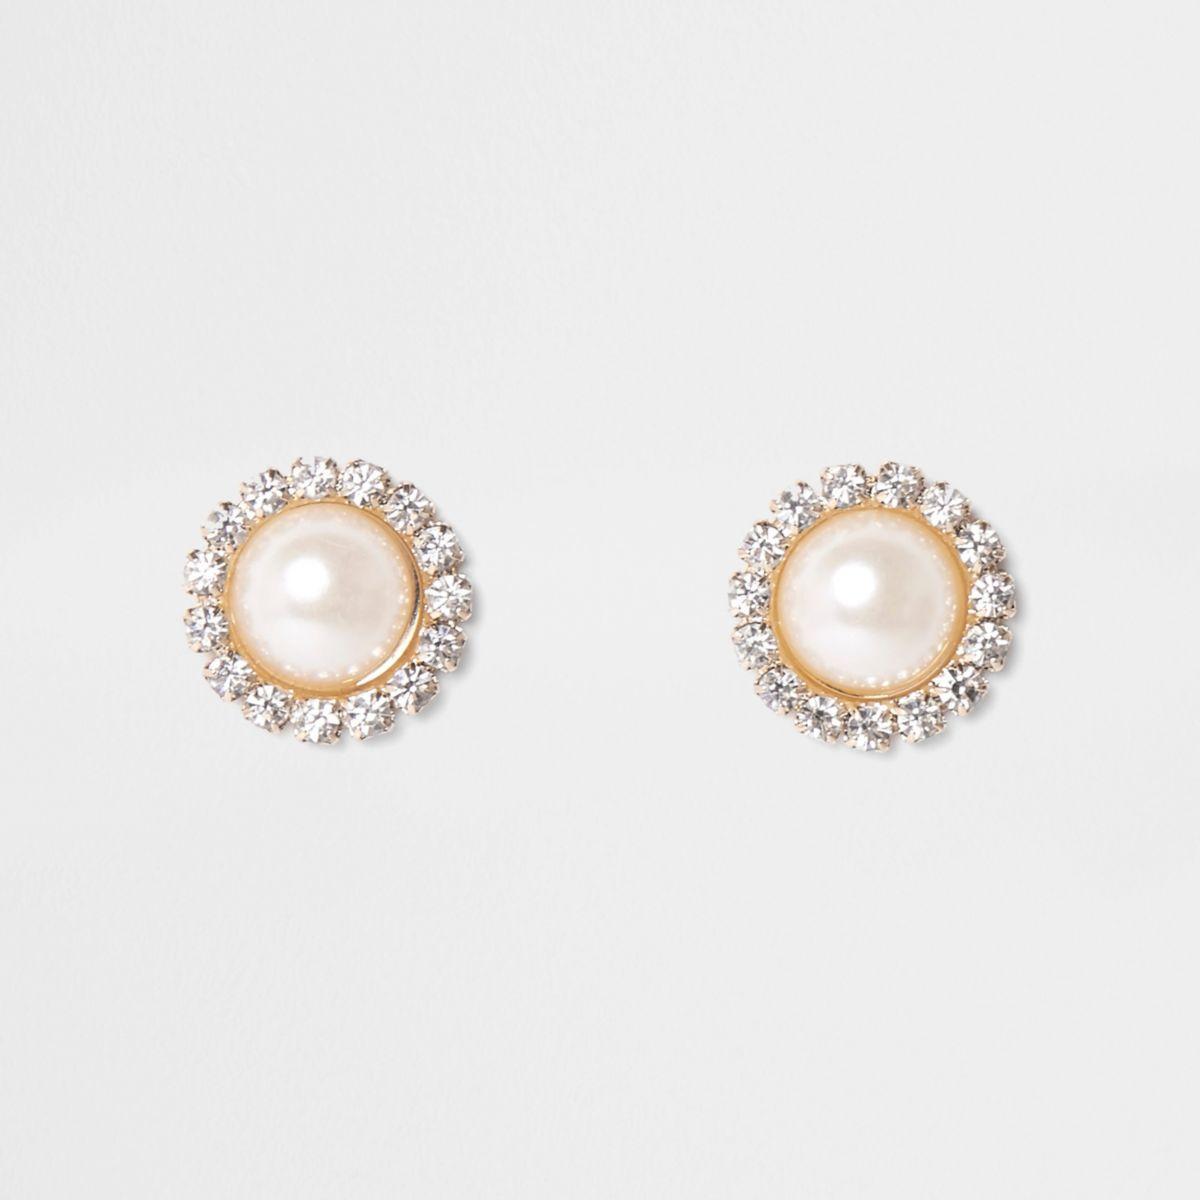 Gold tone round diamante pearl stud earrings